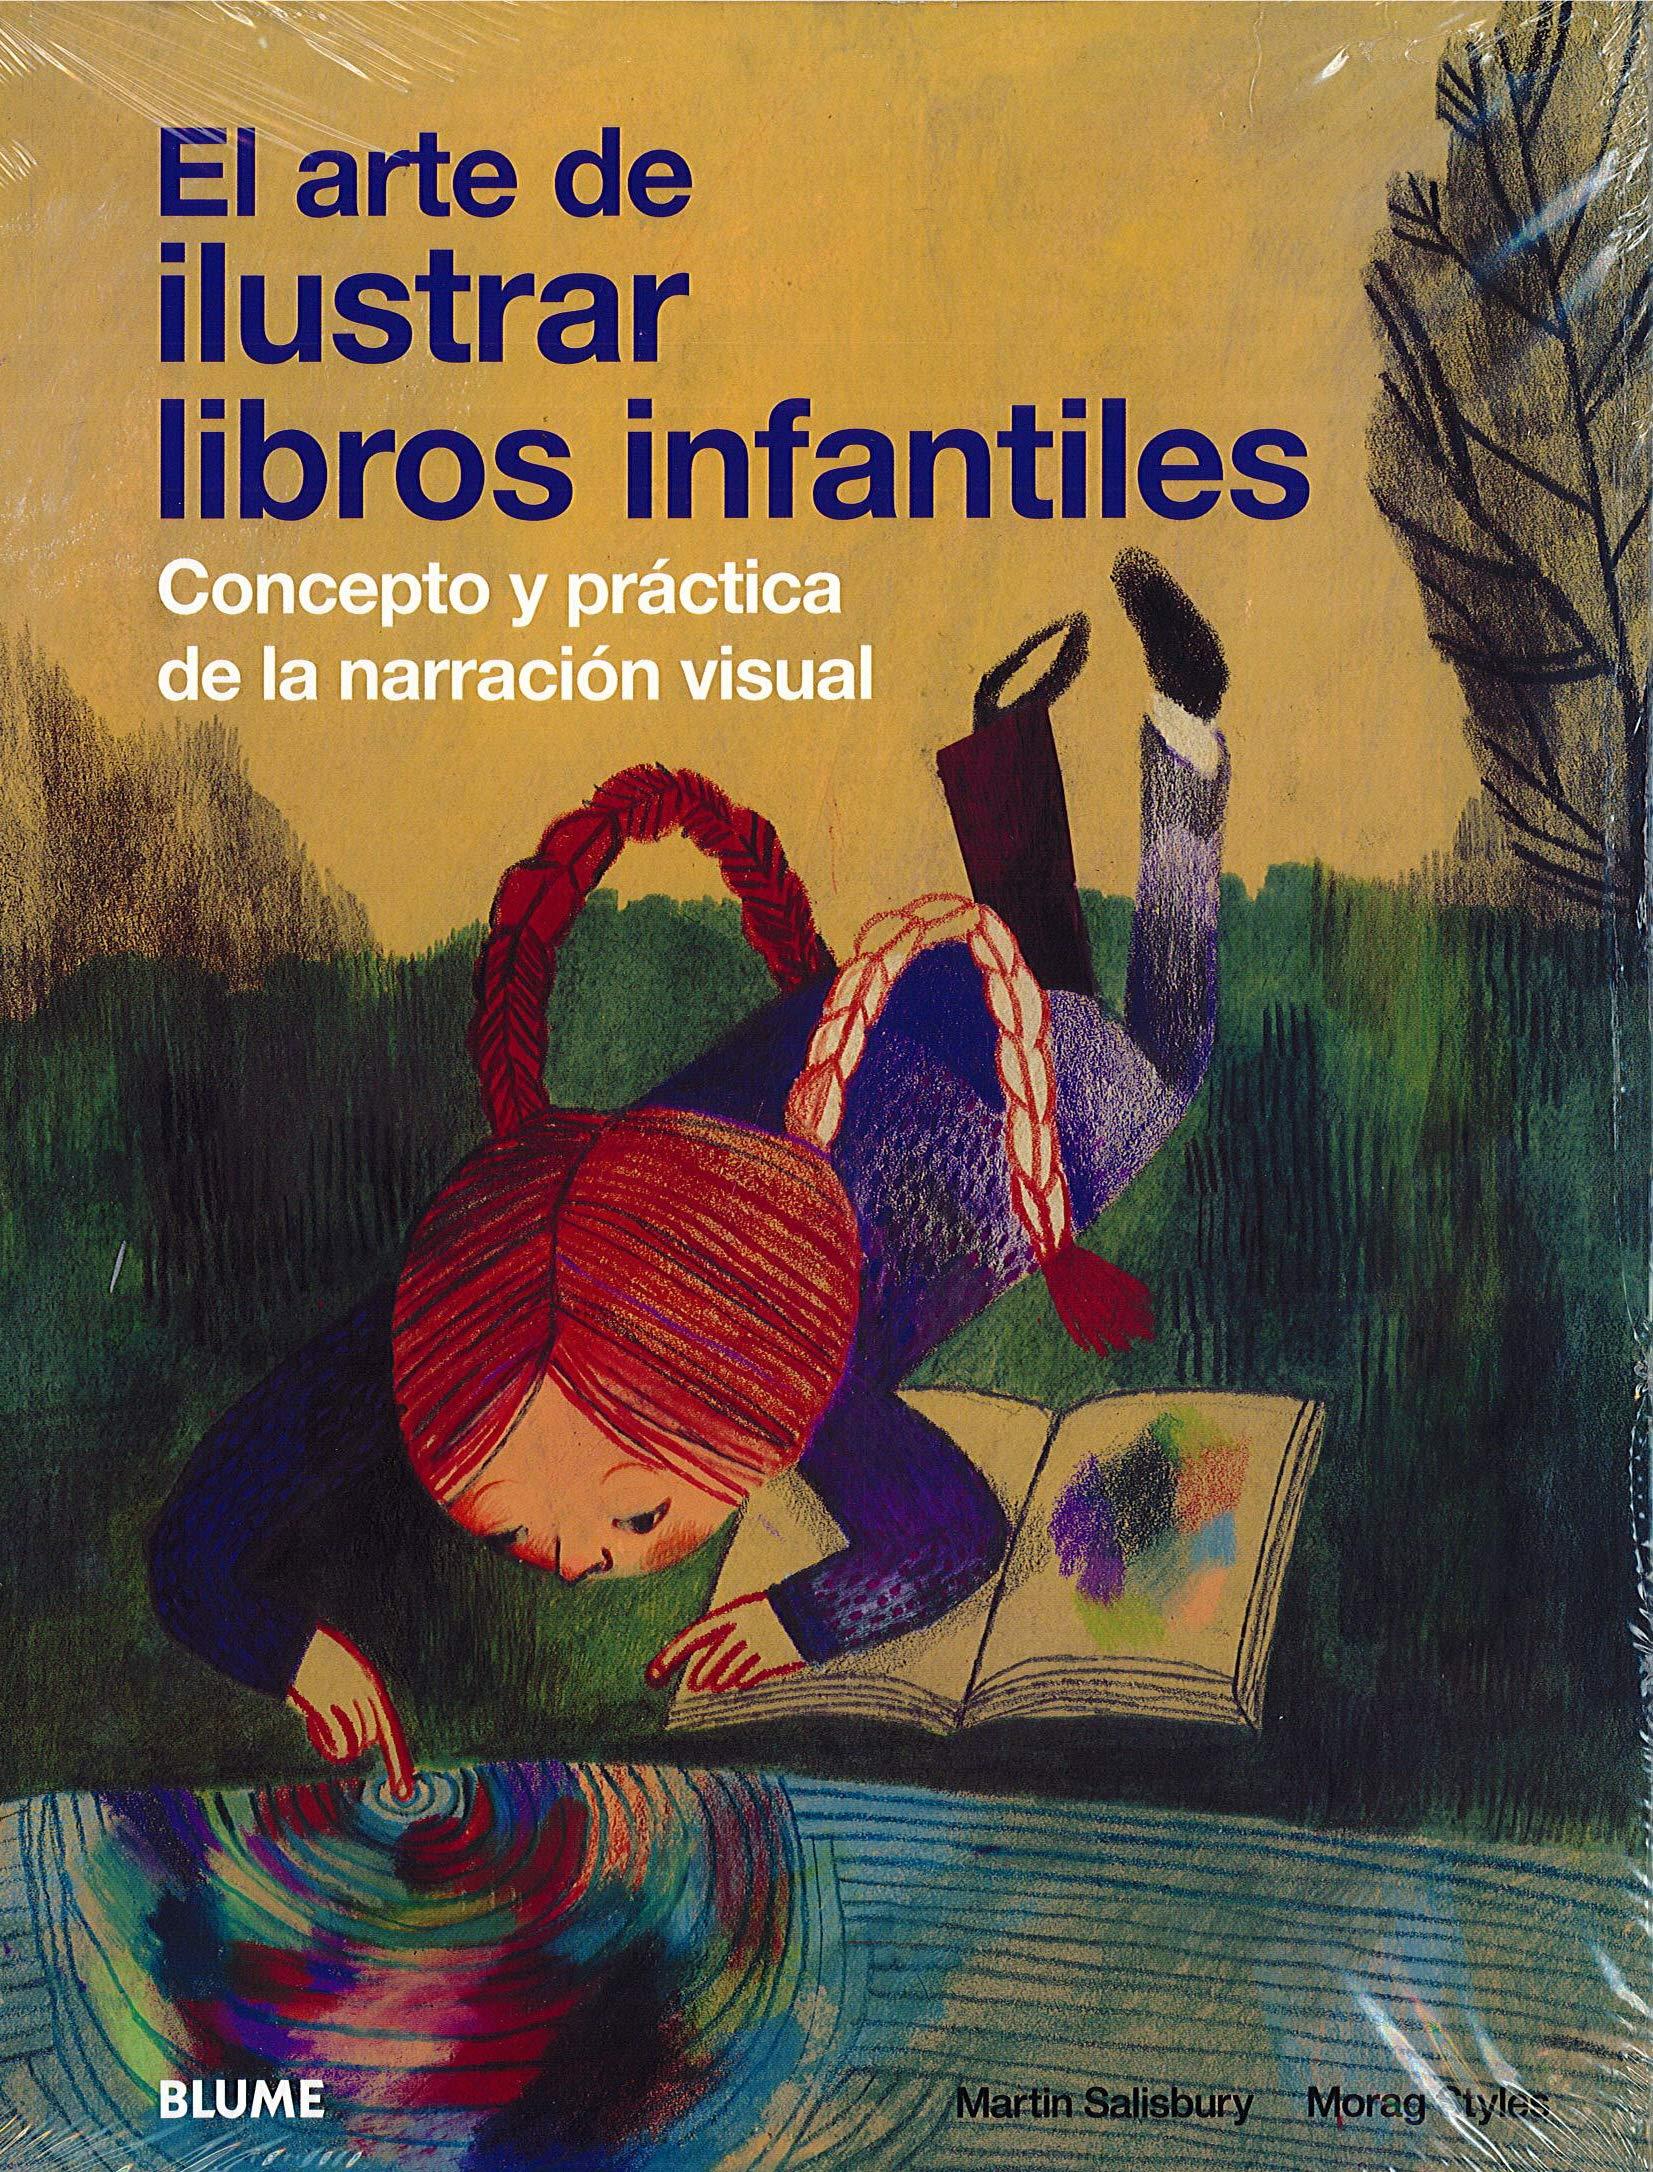 El arte de ilustrar libros infantiles: Amazon.es: Salisbury, Martin, Rodríguez Fischer, Cristina, Diéguez Diéguez, Remedios: Libros